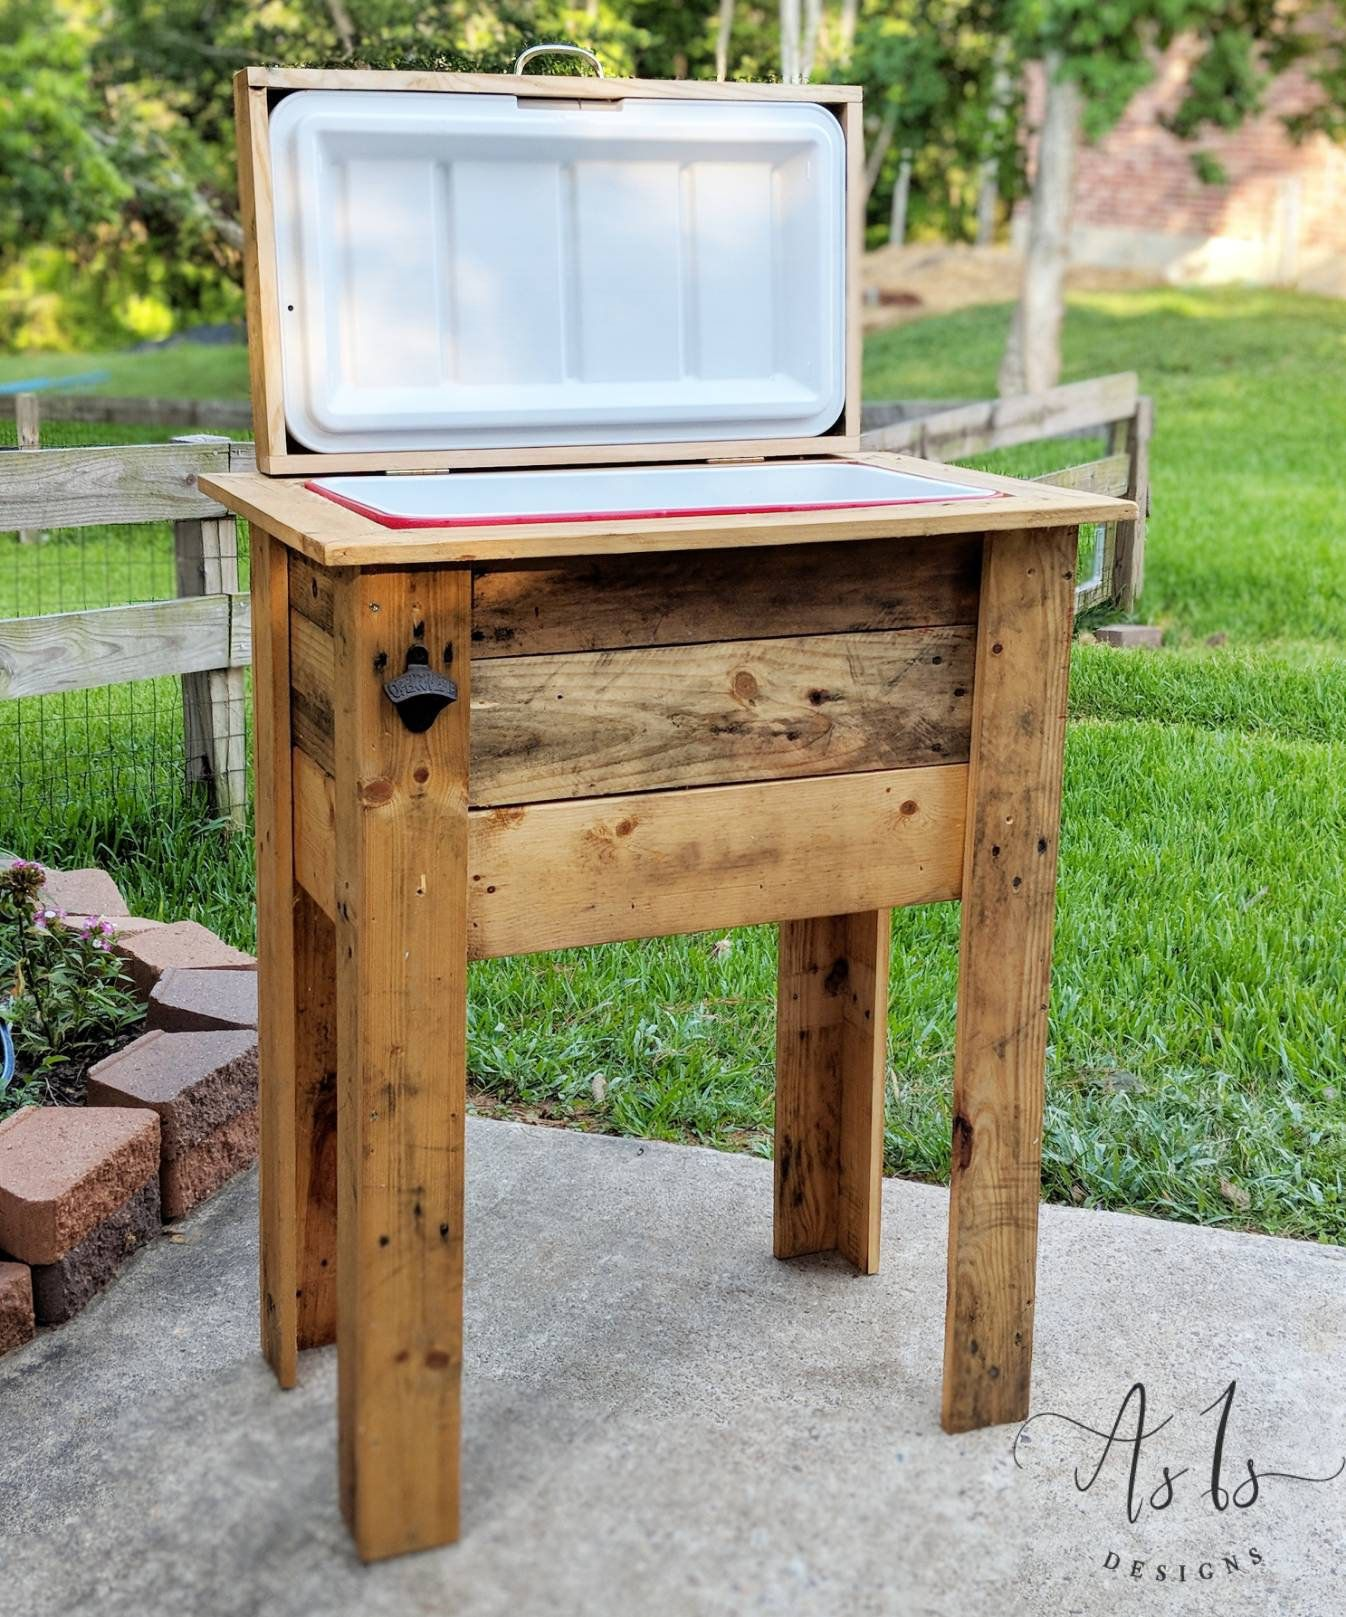 Standing Wood Cooler Reclaimed Wood Cooler Party Cooler Etsy Wood Cooler Cooler Stand Wooden Cooler